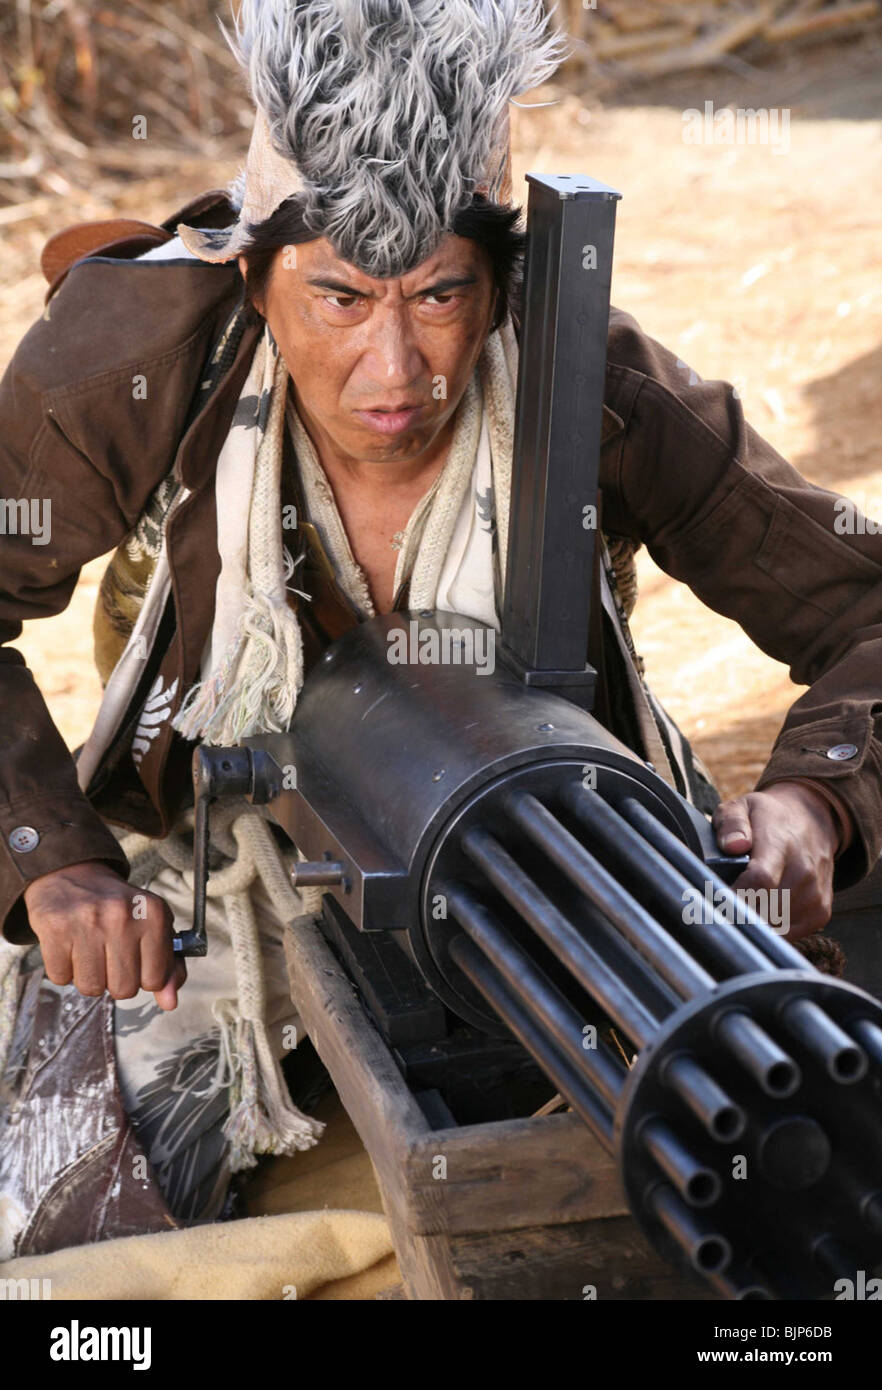 SUKIYAKI WESTERN DJANGO (2007) MIIKE TAKASHI (DIR) 006 - Stock Image